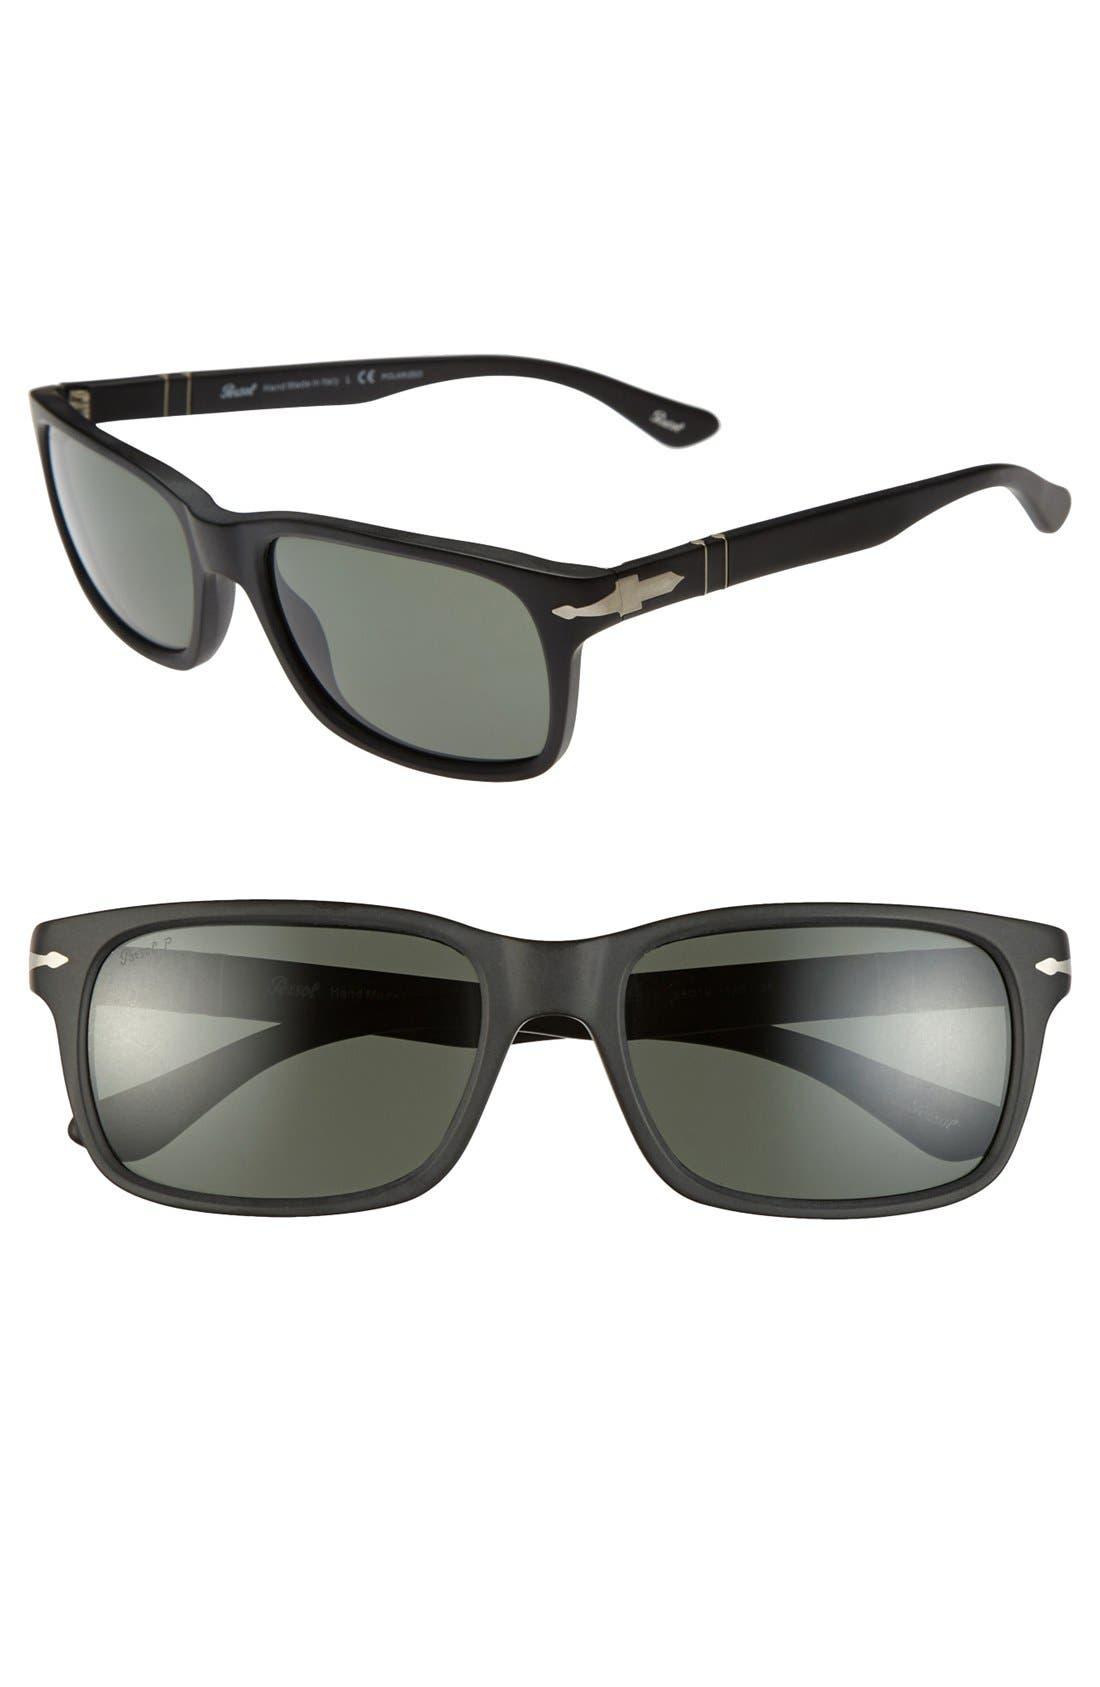 Main Image - Persol 58mm Polarized Sunglasses